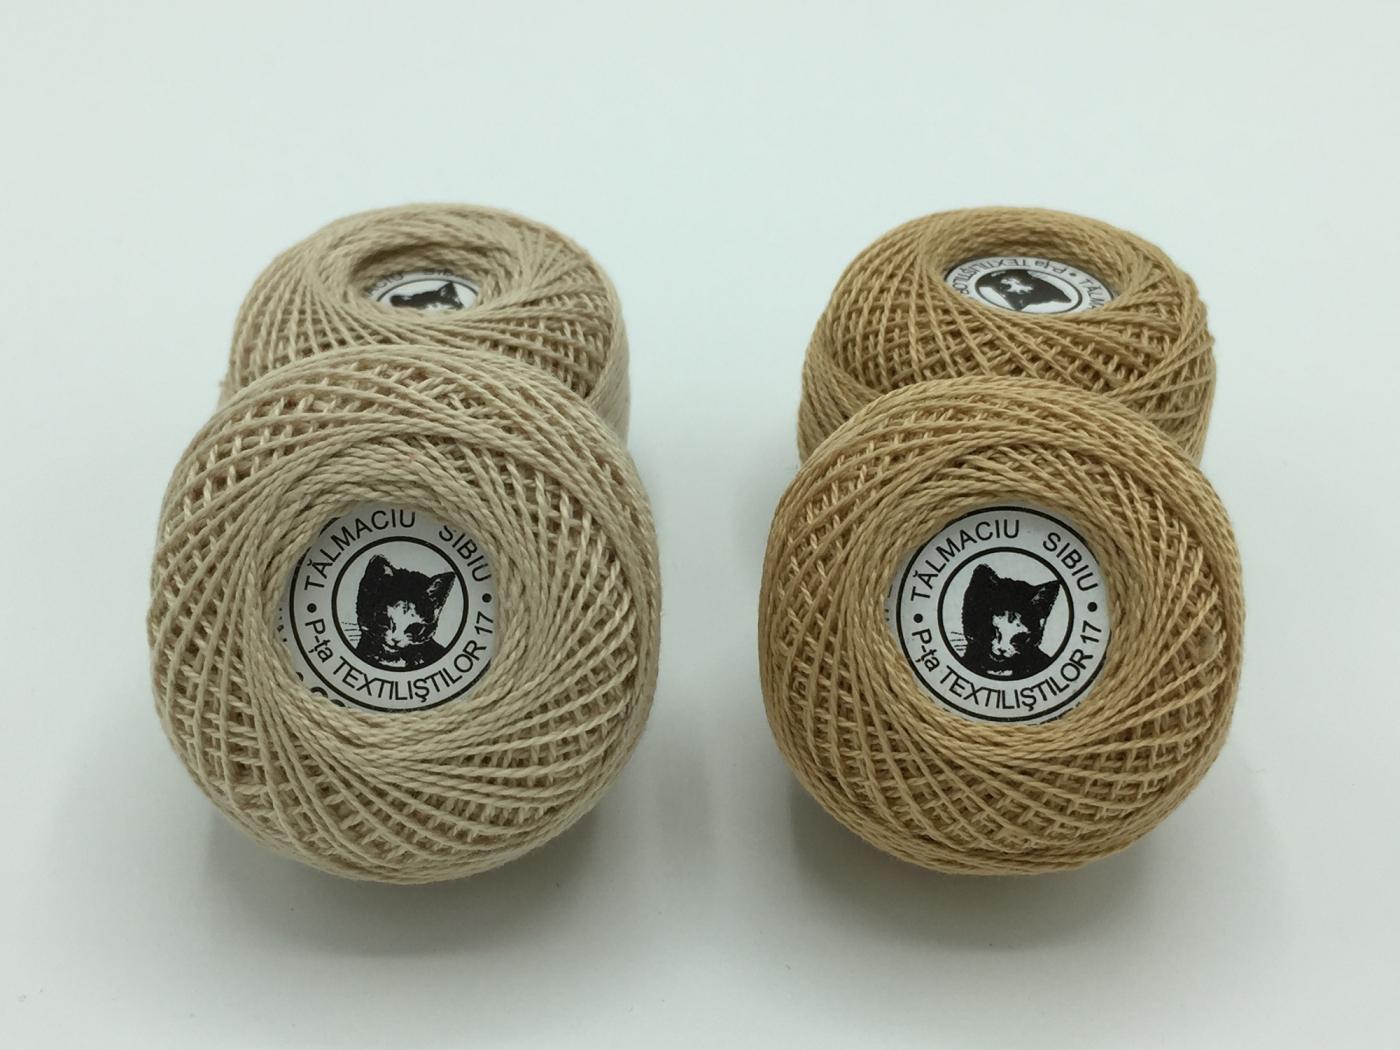 Ata cotton-perle 100% bumbac - Bej - 10 gheme - Romanofir 20/2